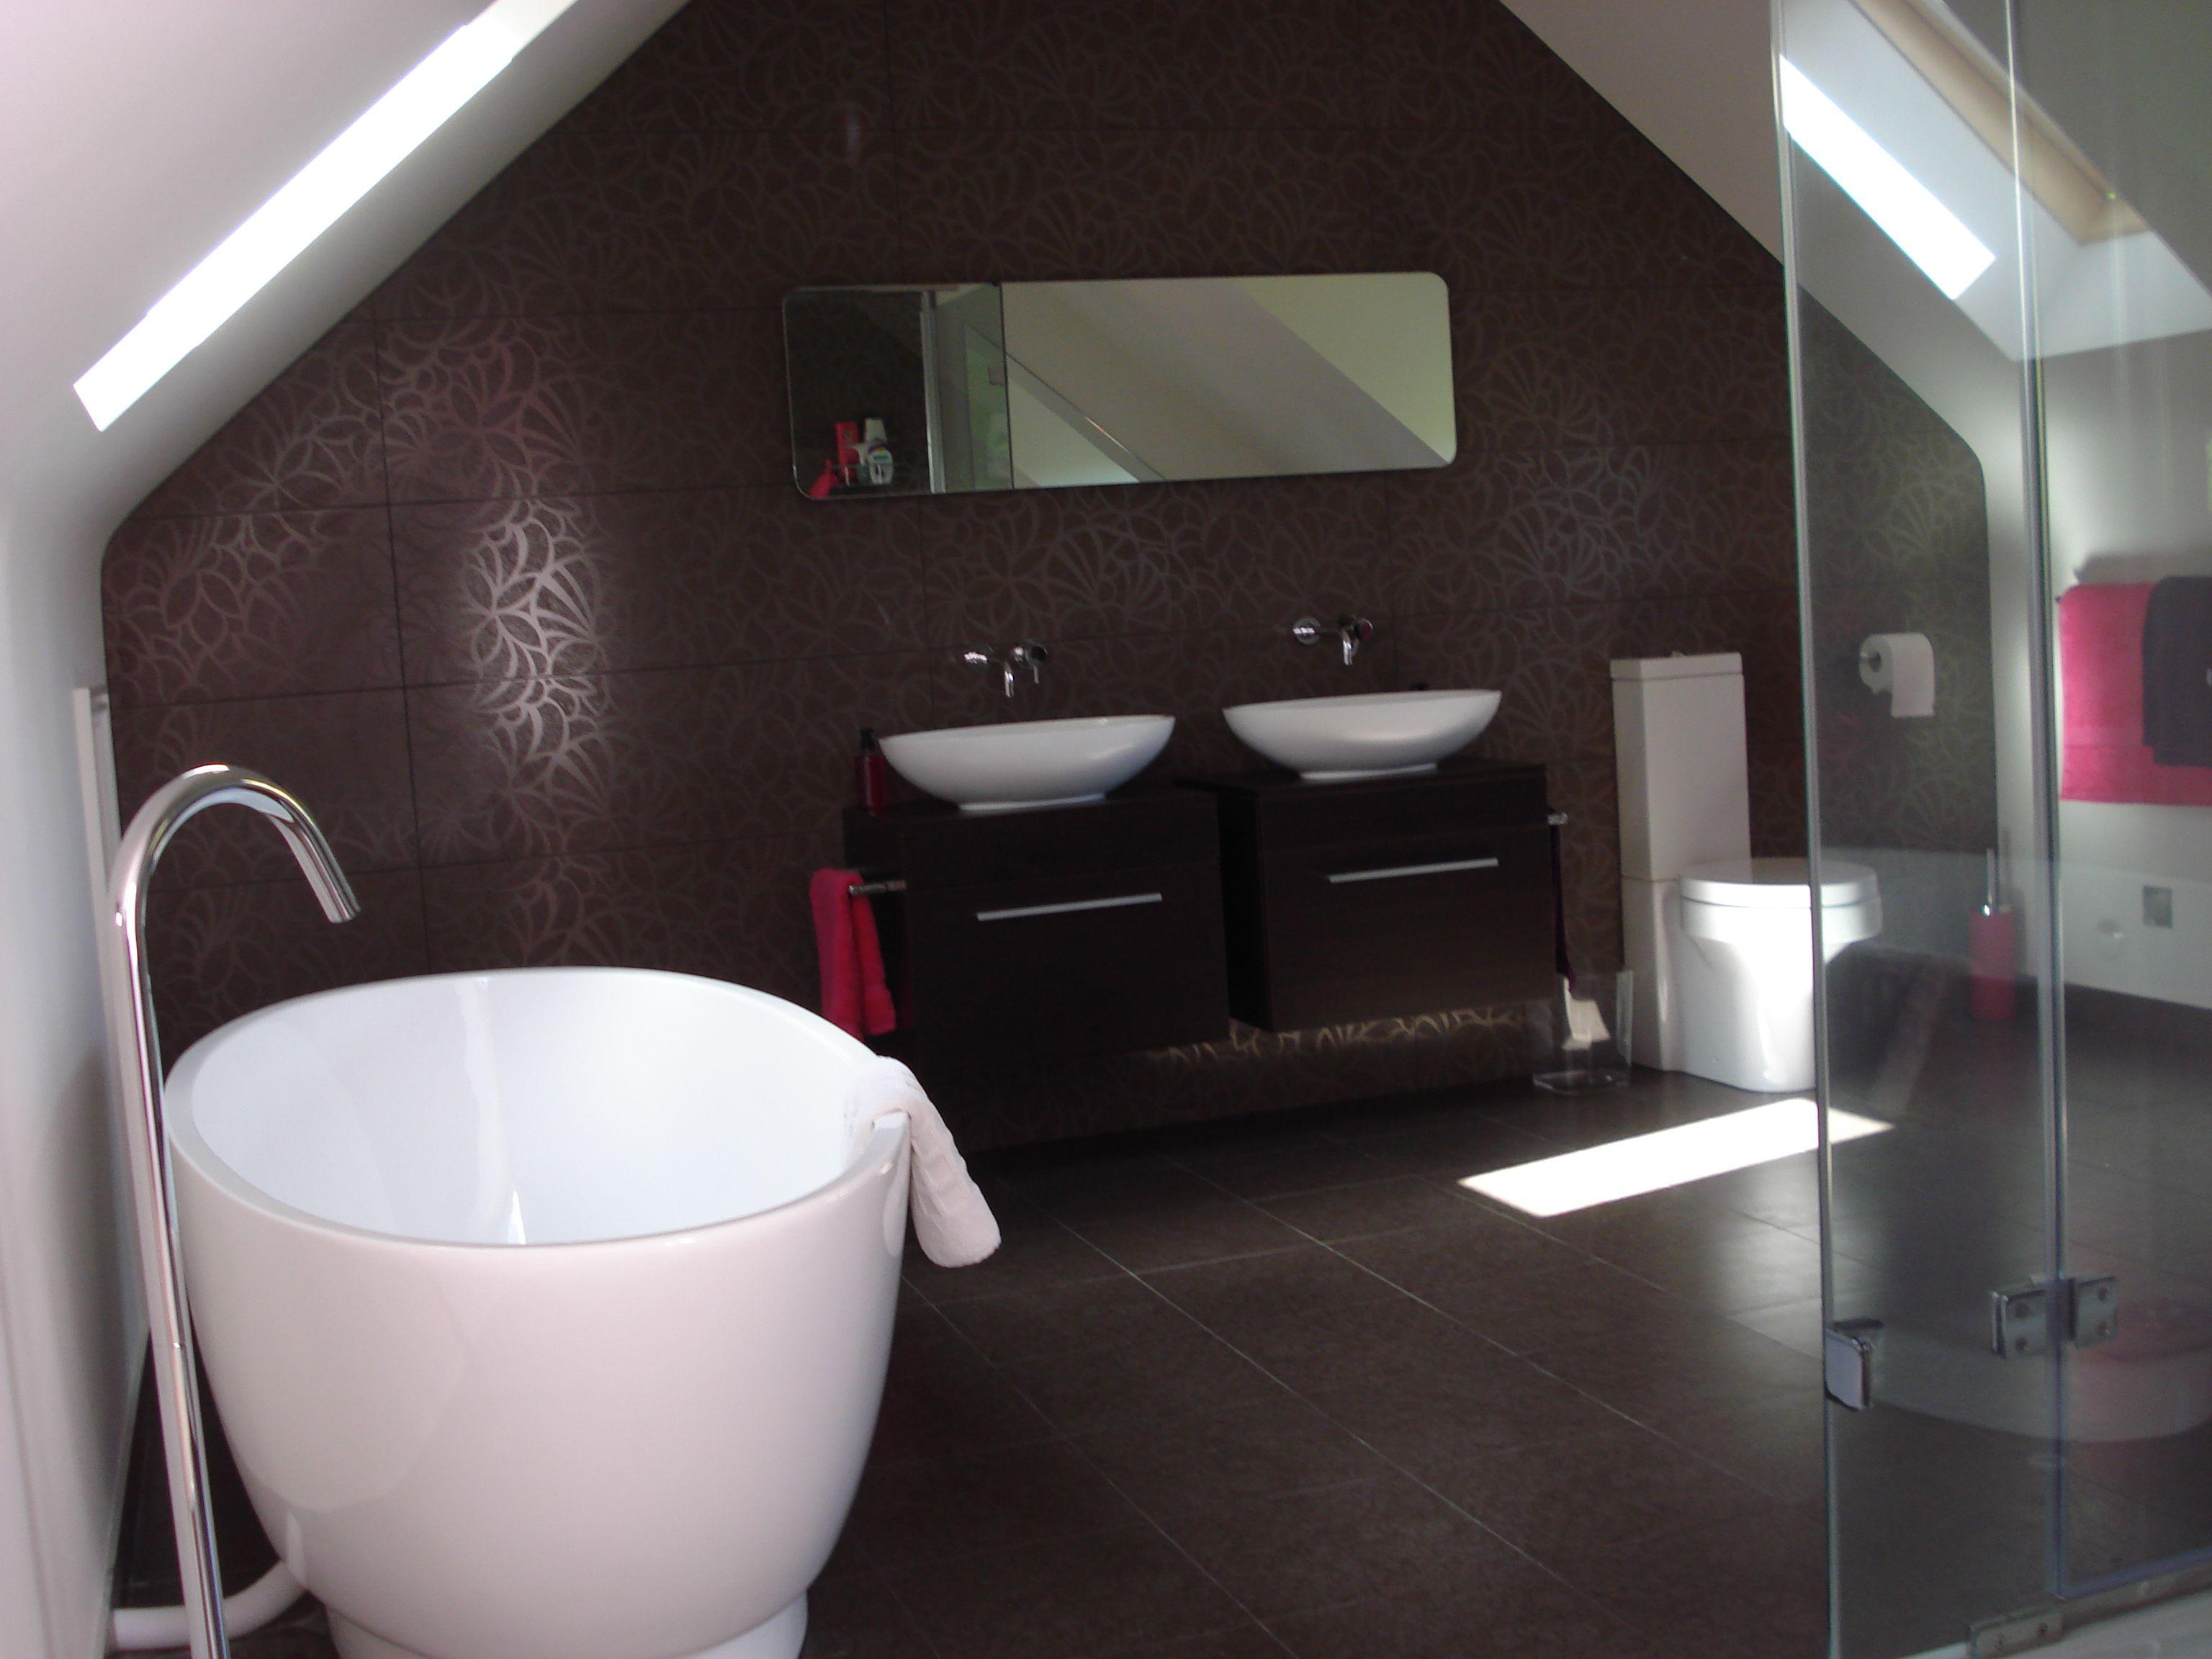 A loft by design HOME - A loft by design